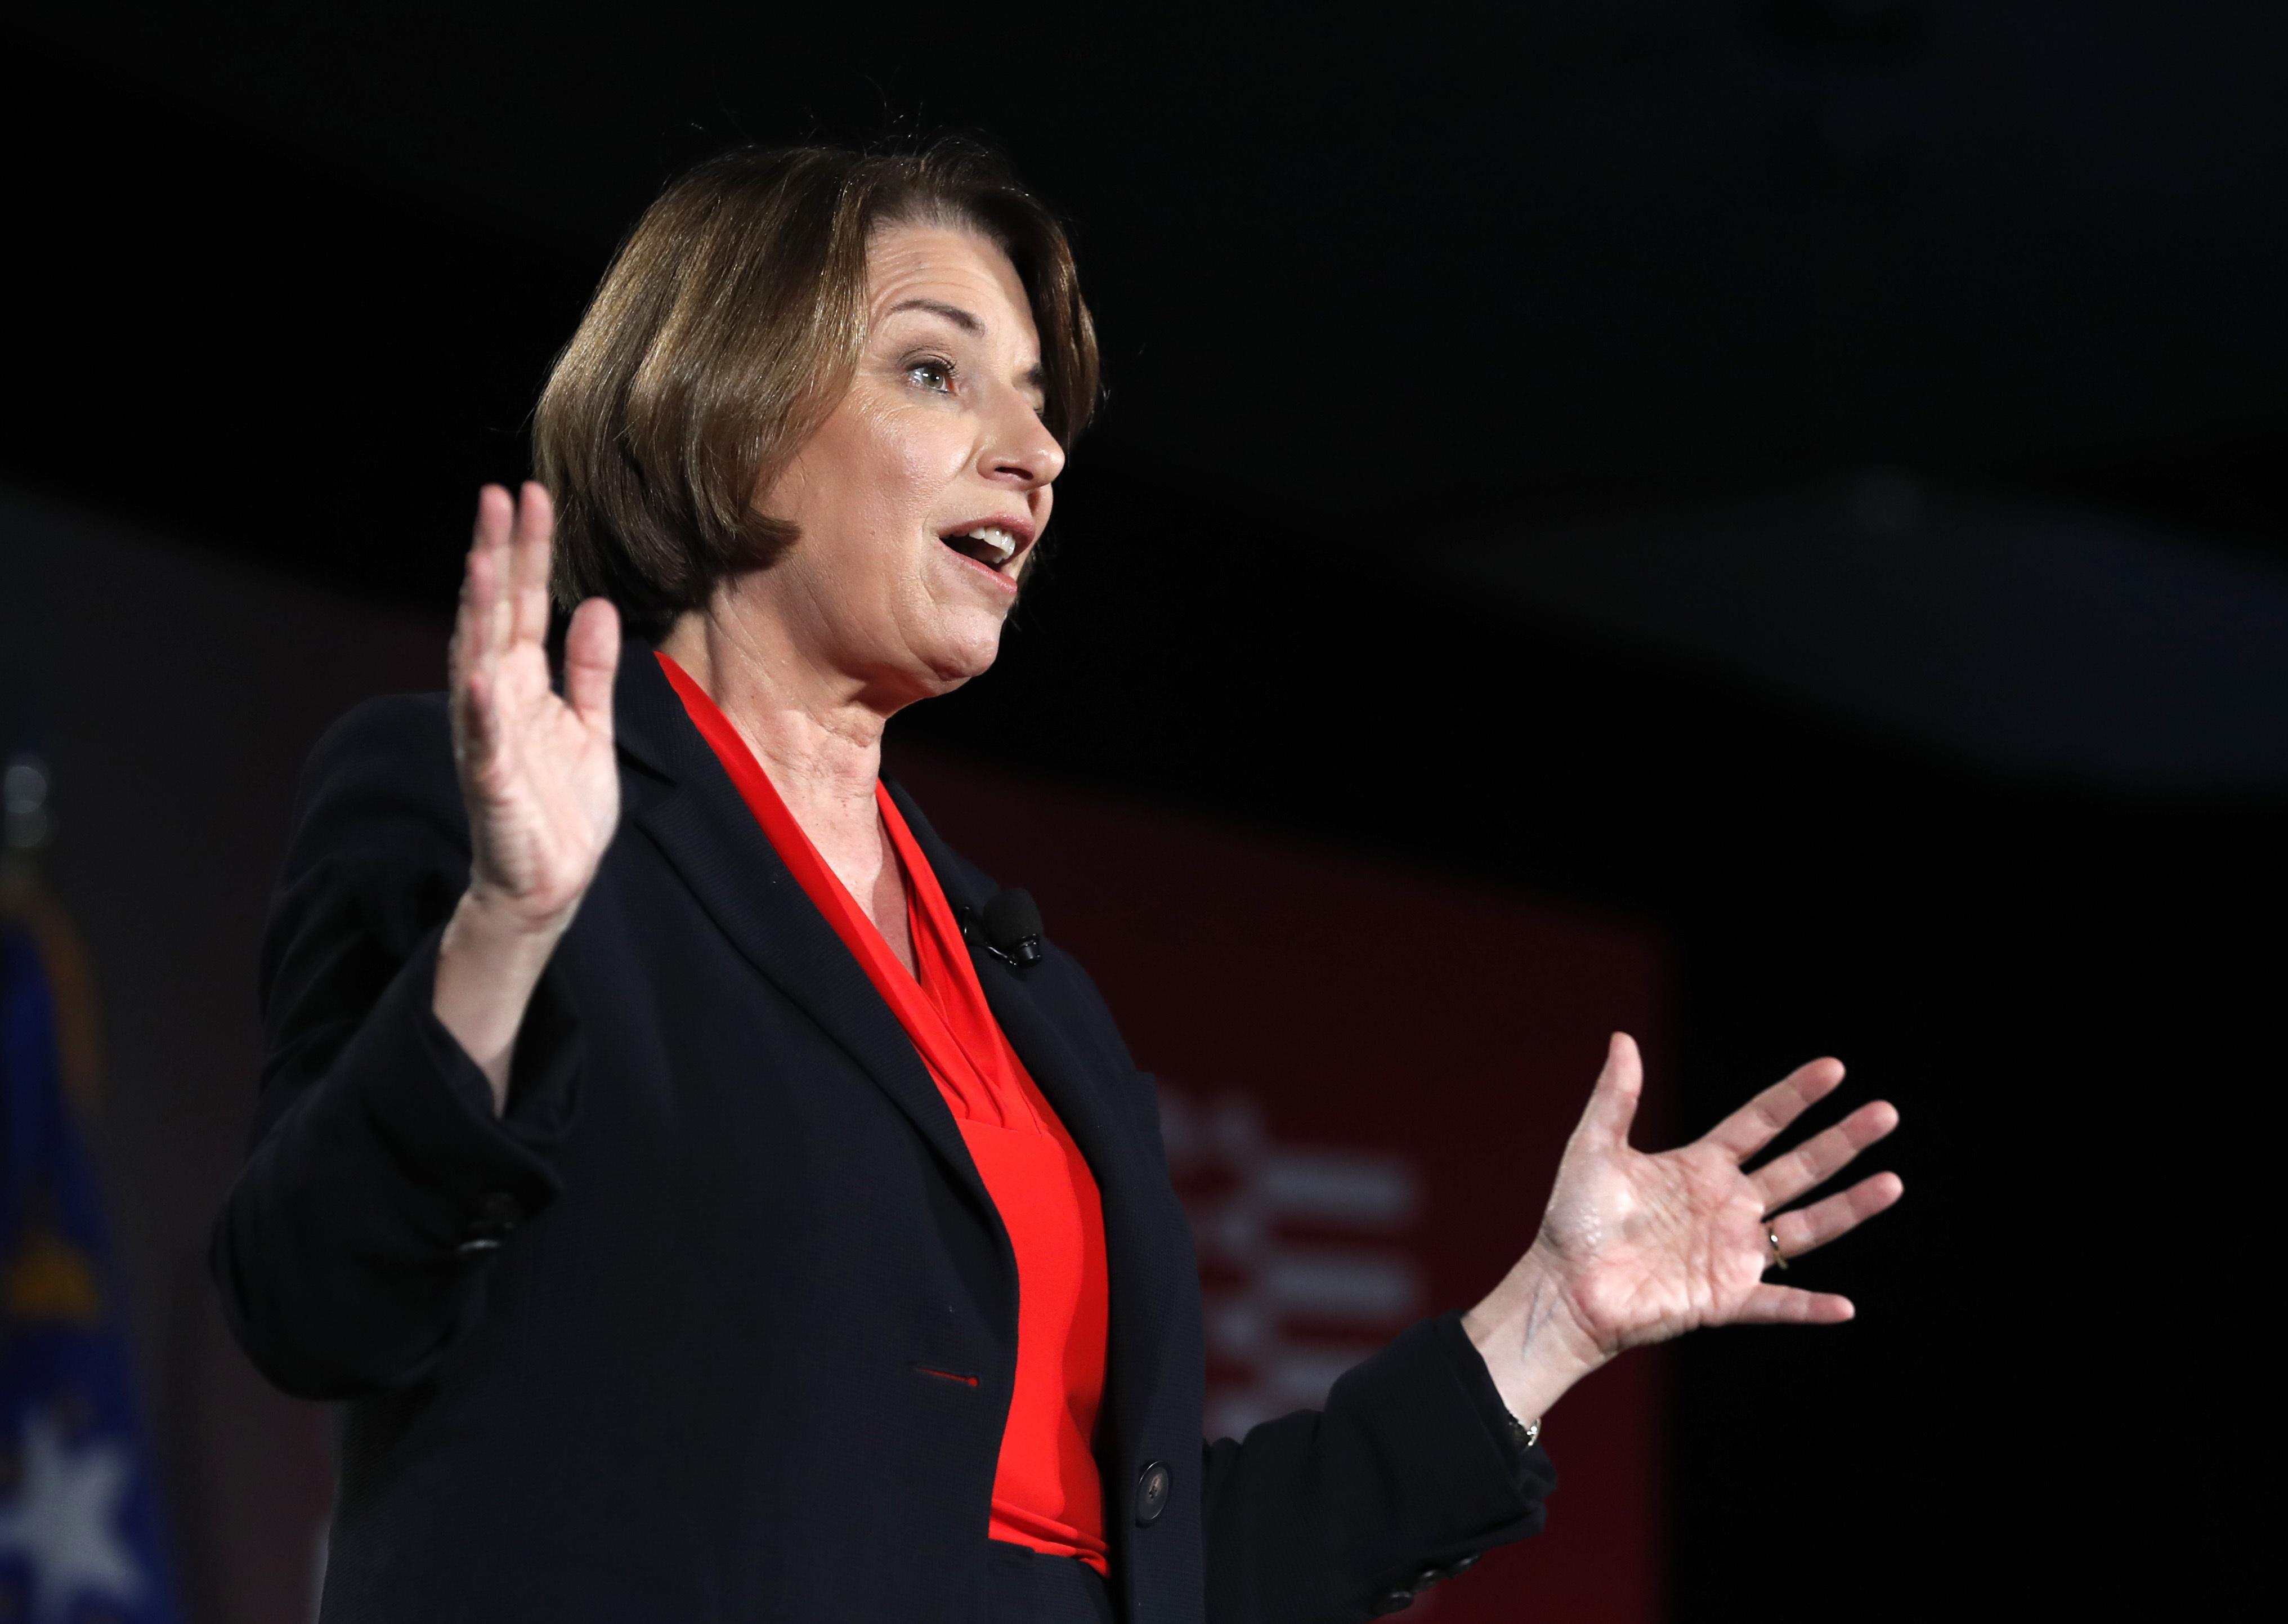 U.S. Sen. Amy Klobuchar speaks on gun violence in Little Rock